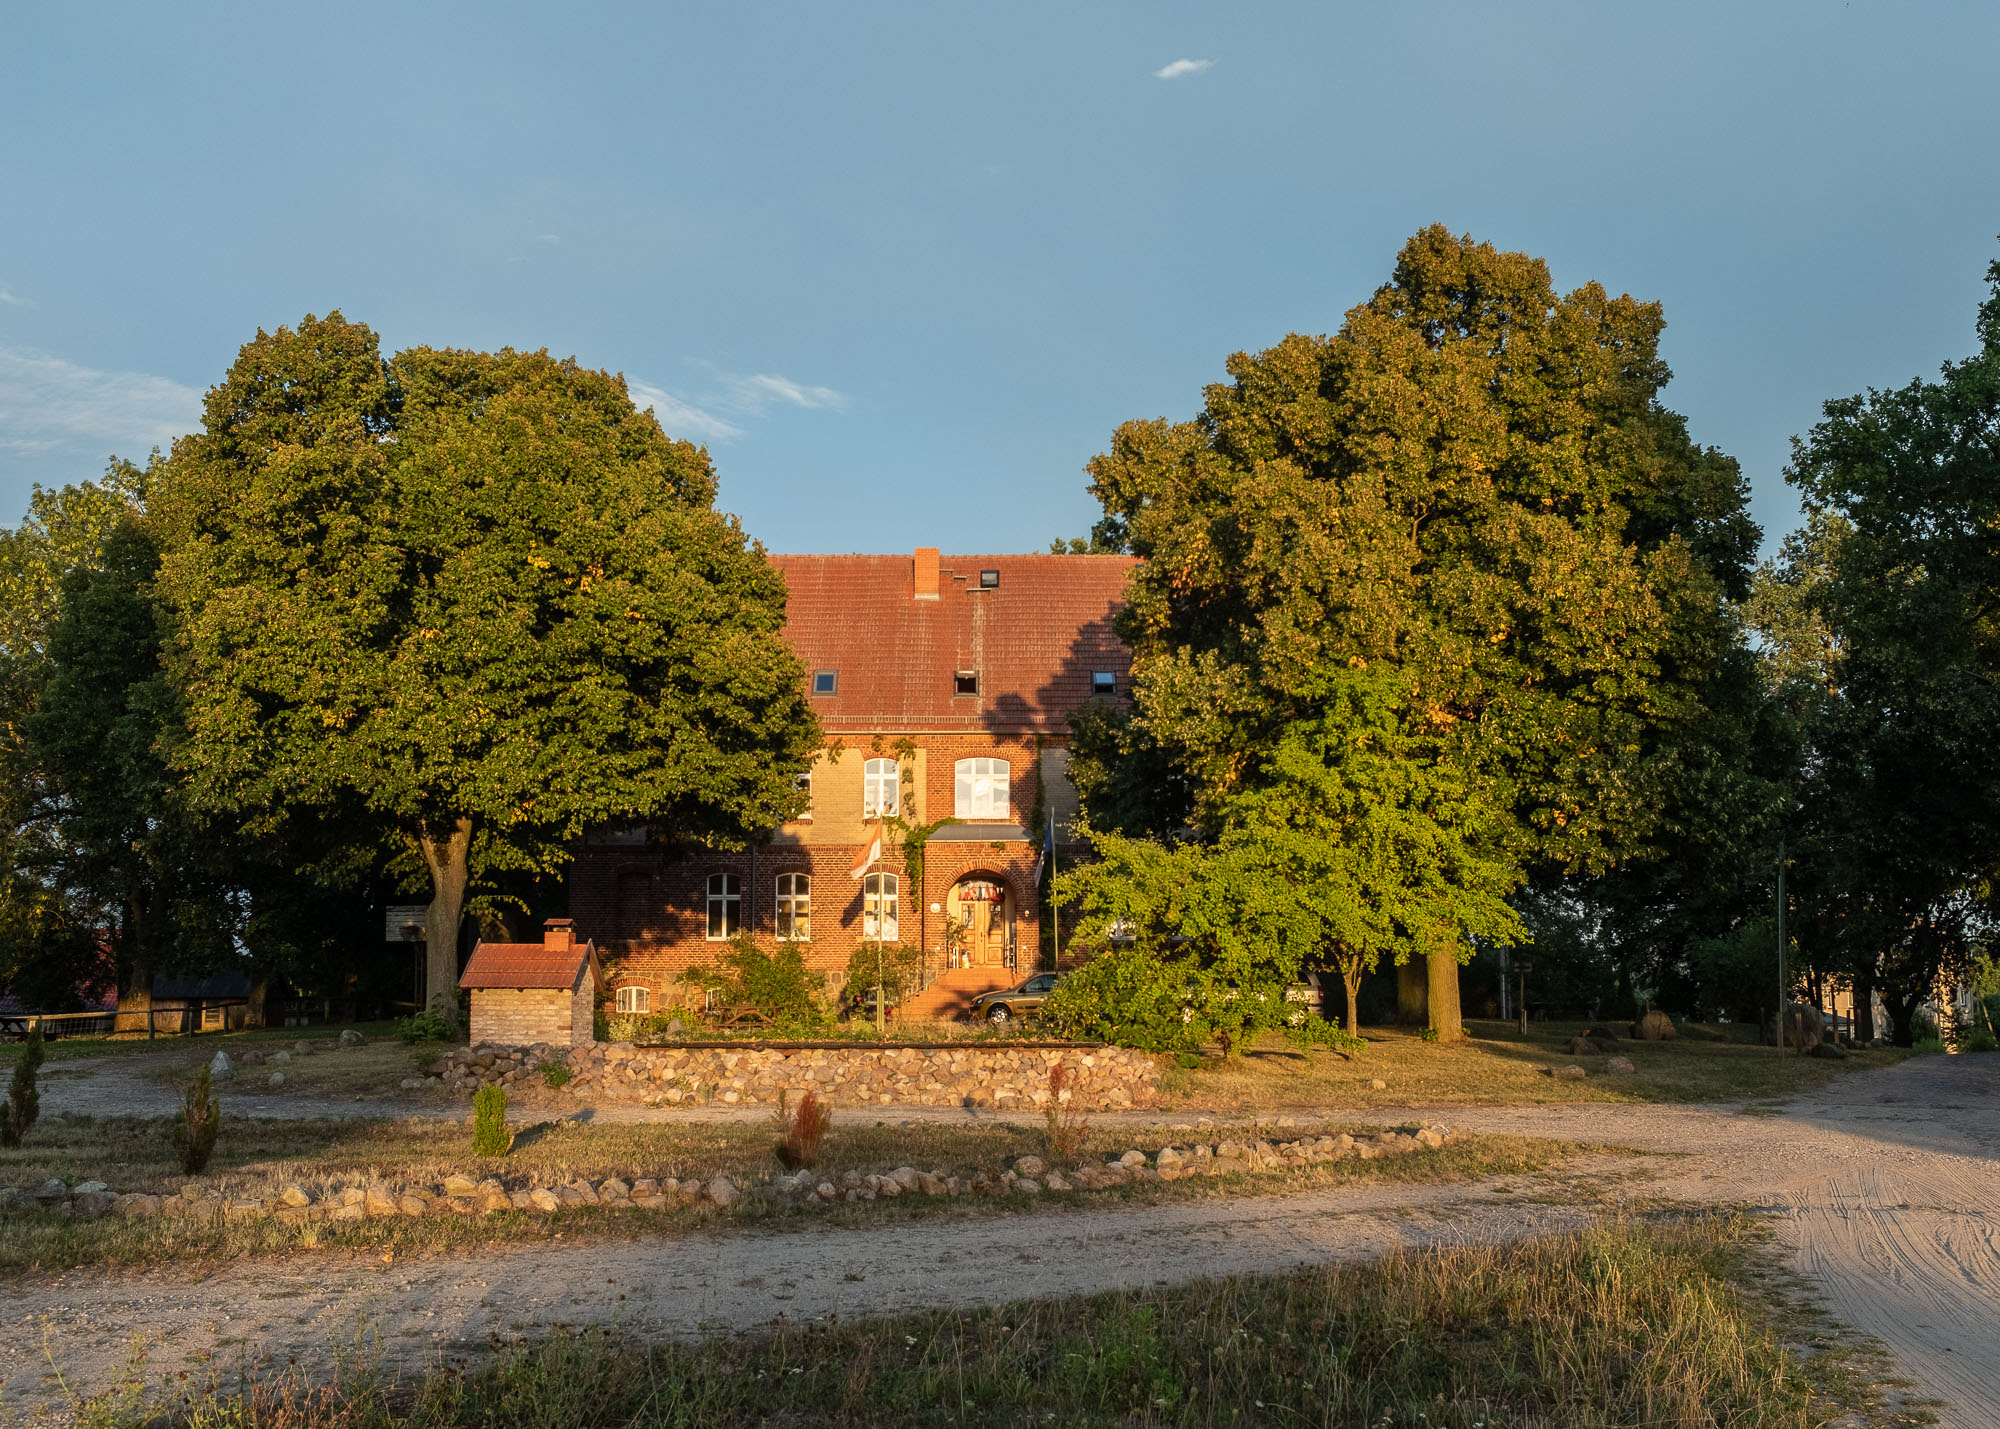 Haus Neudorf im Sonnenuntergang